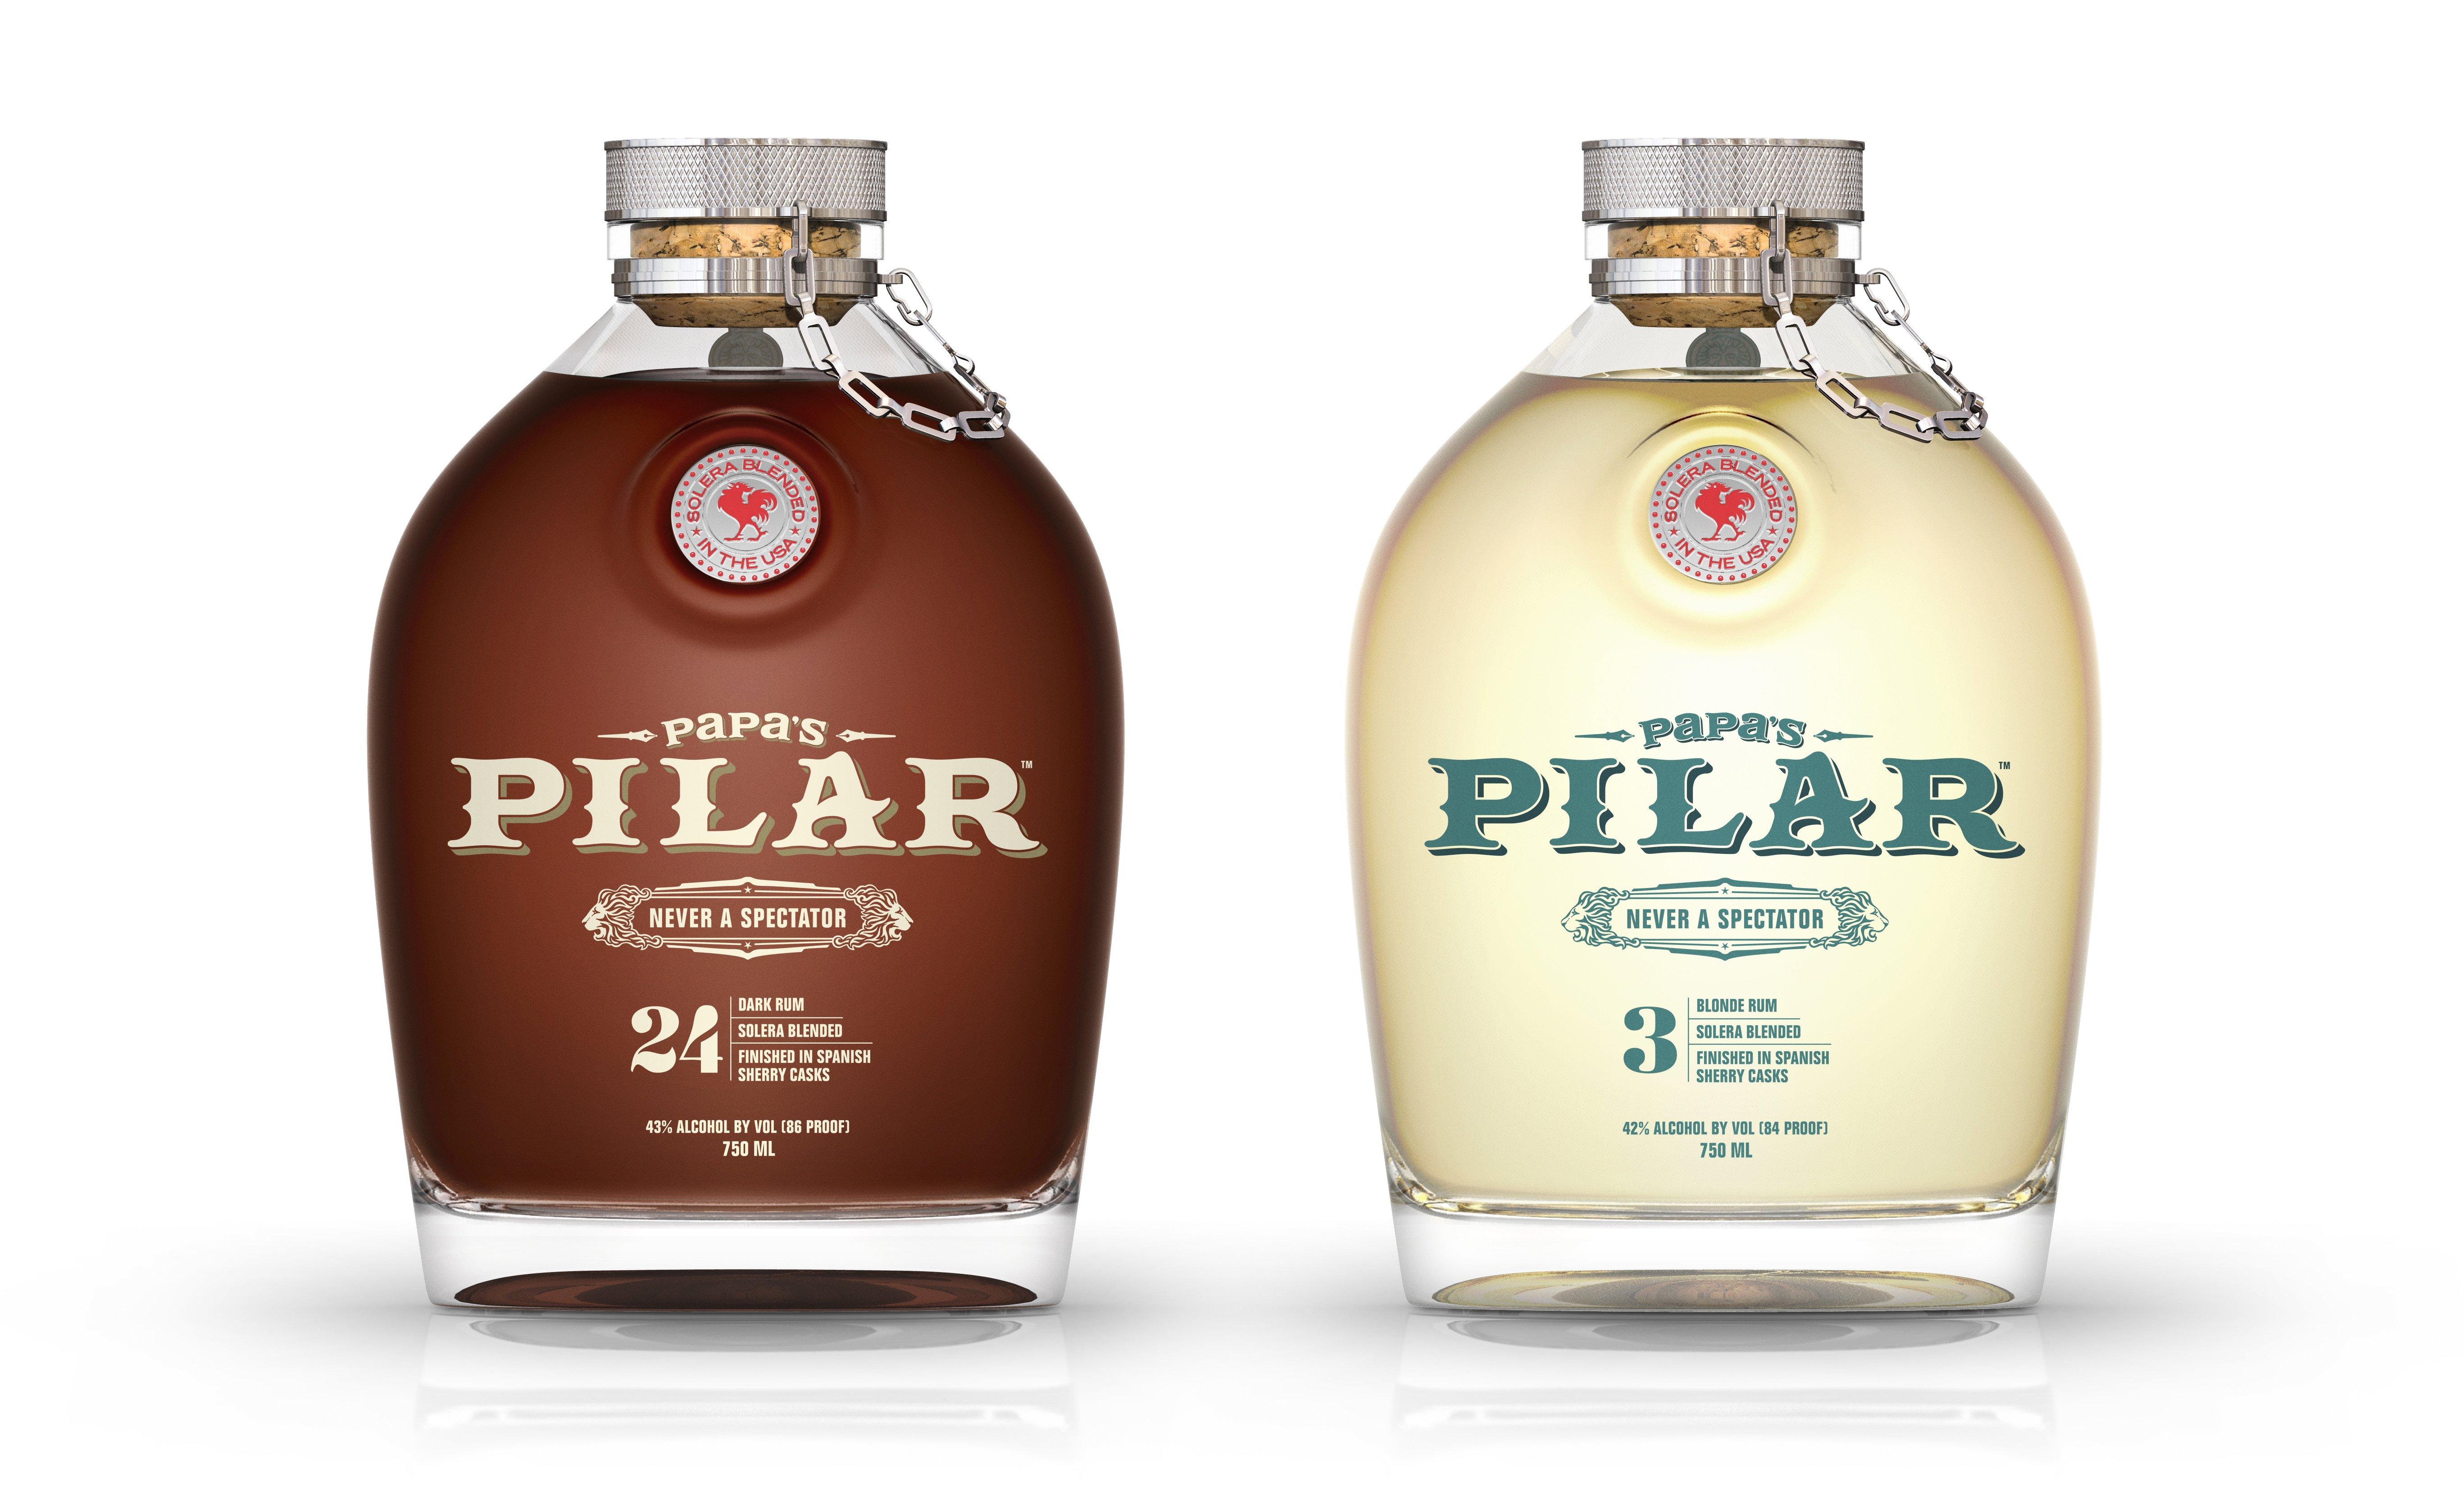 Papa's Pilar 24 Dark Rum Review - thefatrumpirate.com